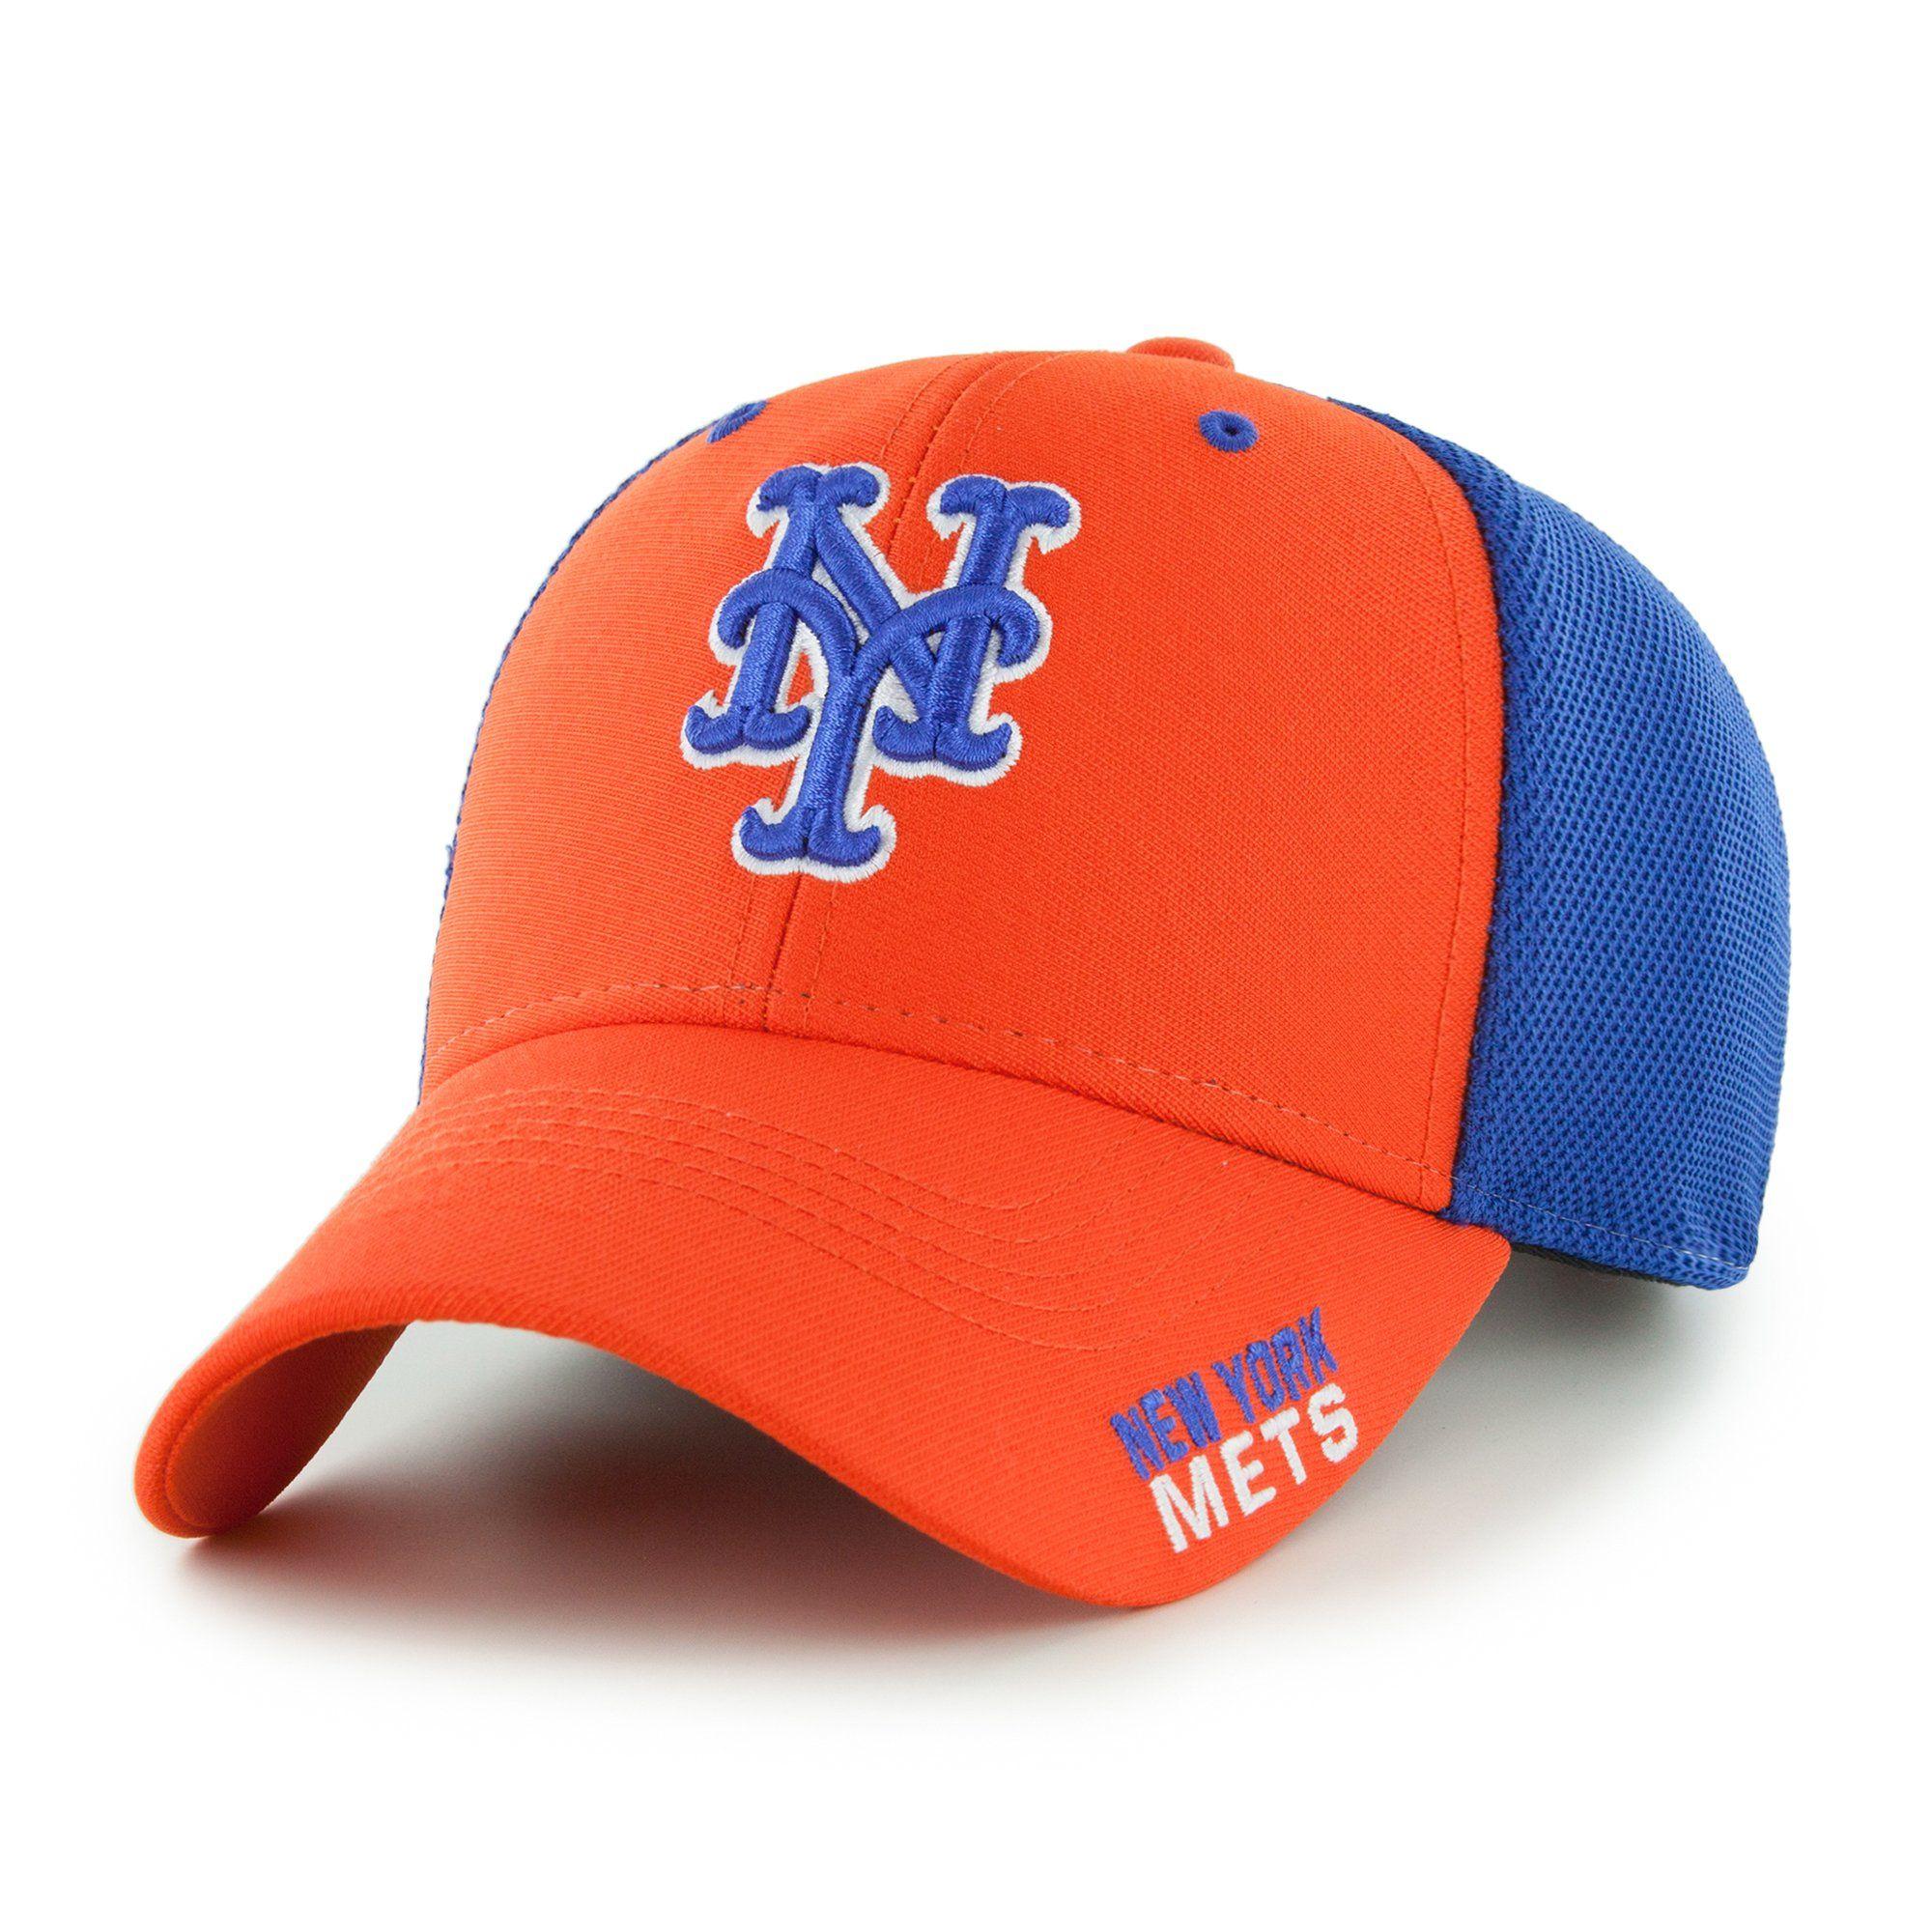 698ed57c0a7 New York Mets New York Mets MLB Baseball Cap   Hat - Orange Blue ...